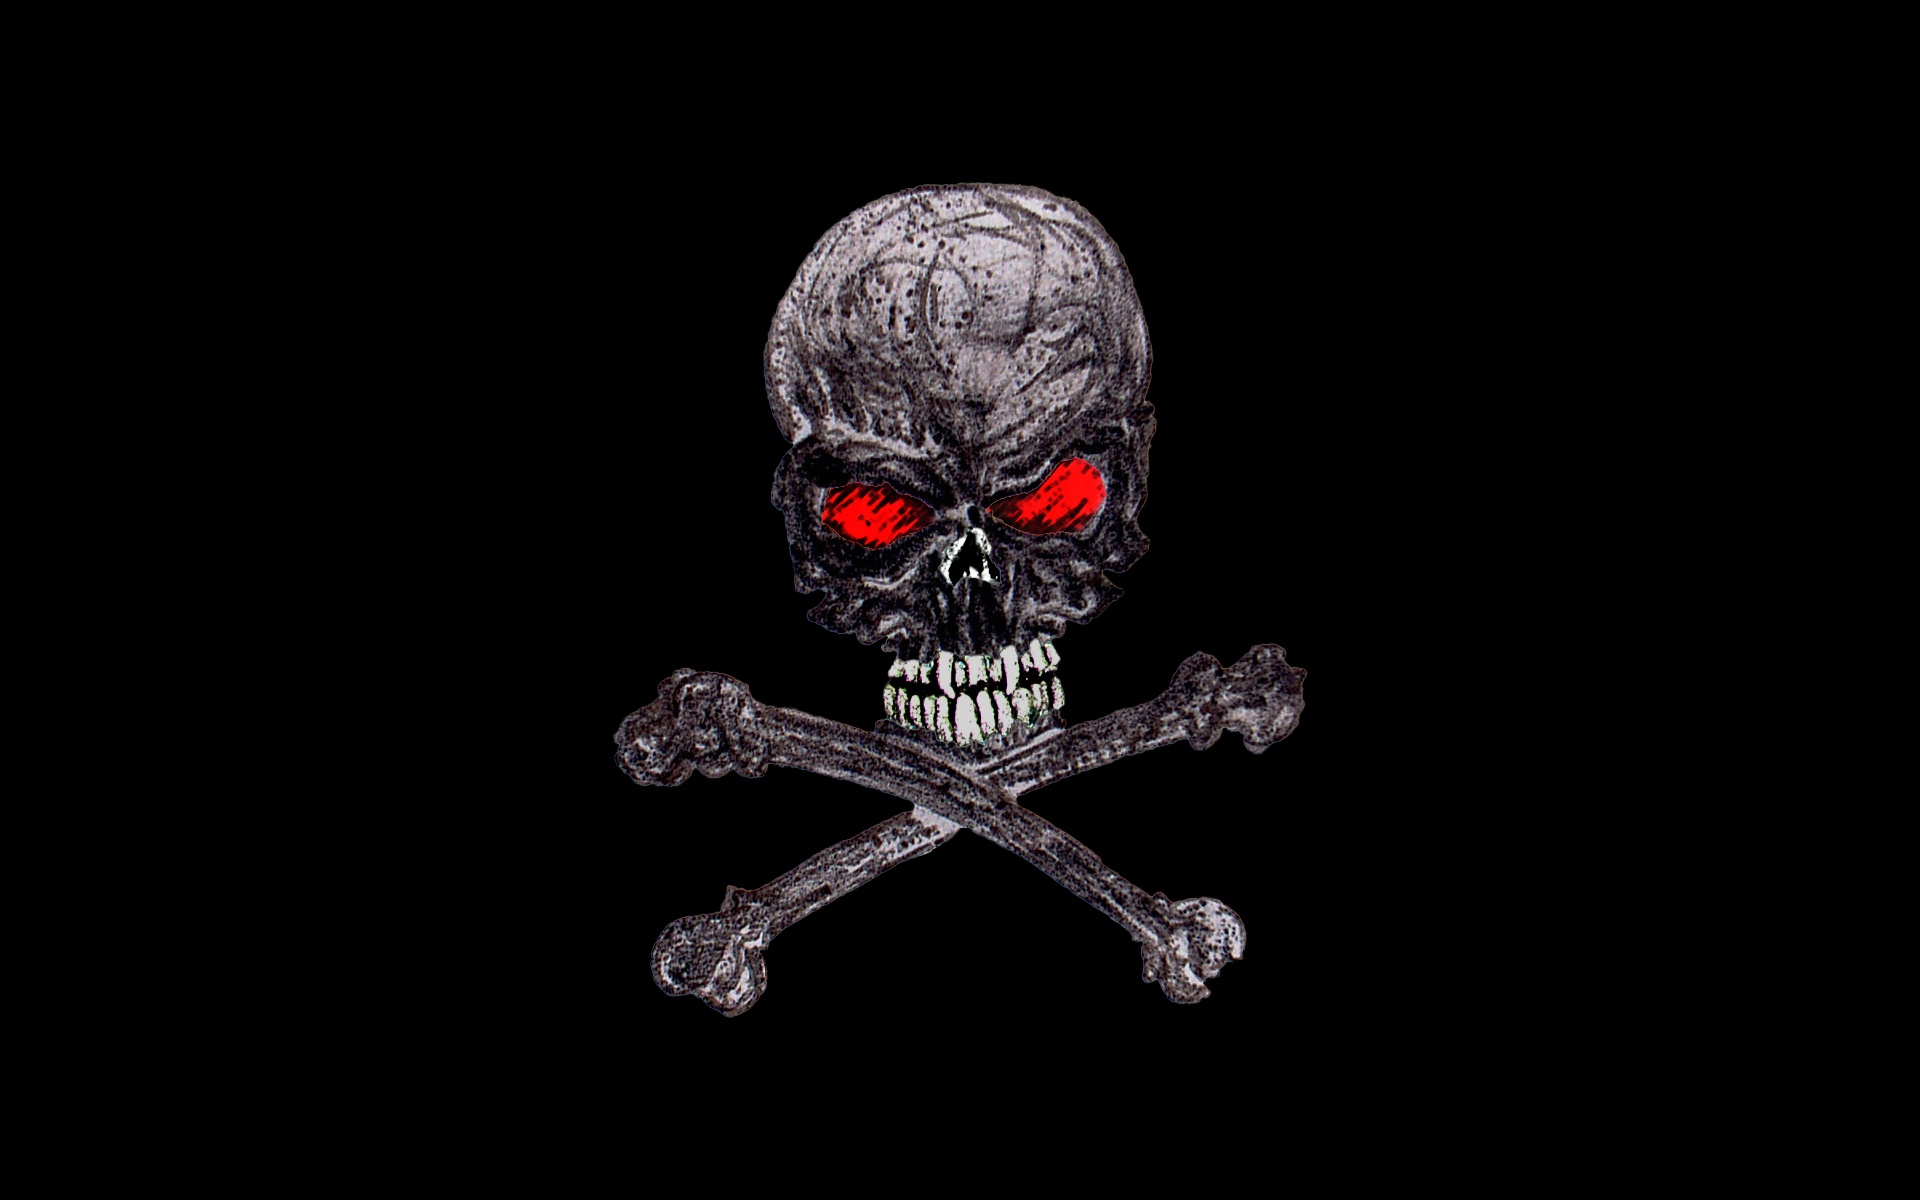 <b>Skull</b> Wallpapers - 57-T.Mall.com